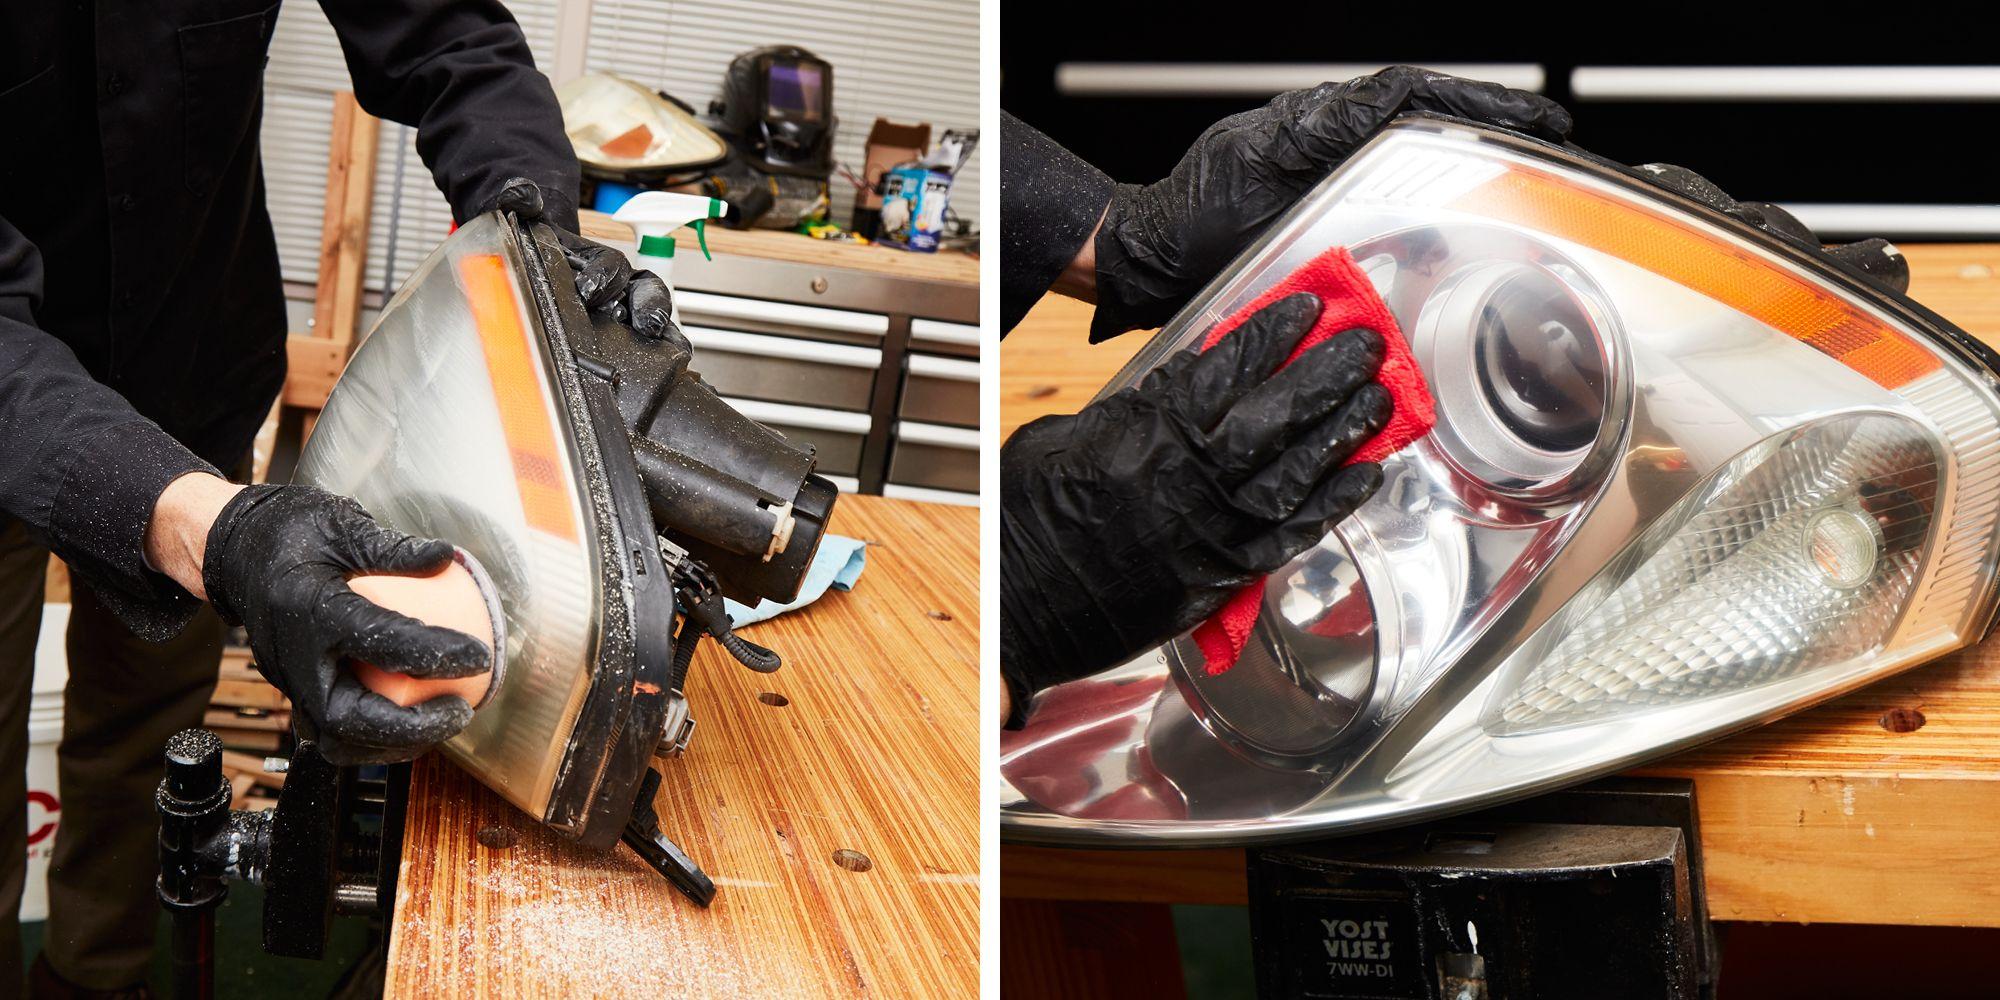 The Best Headlight Restoration Kits